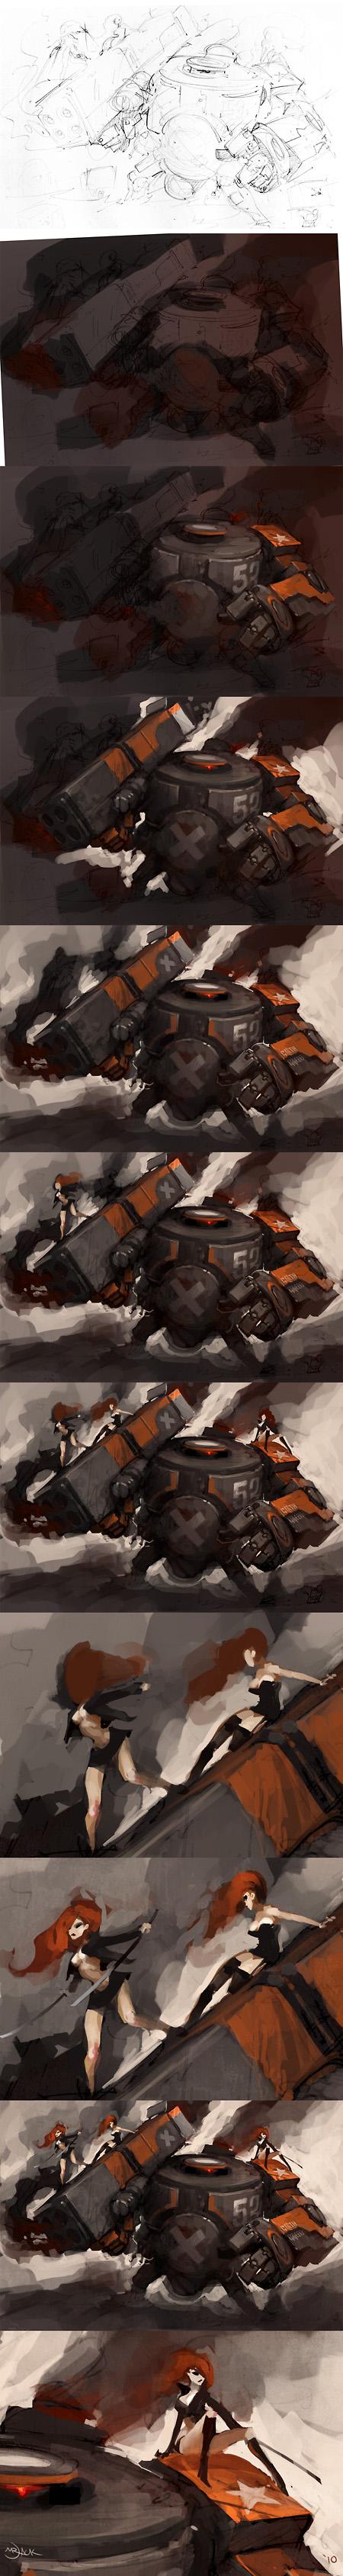 Bramble Process by Mr--Jack